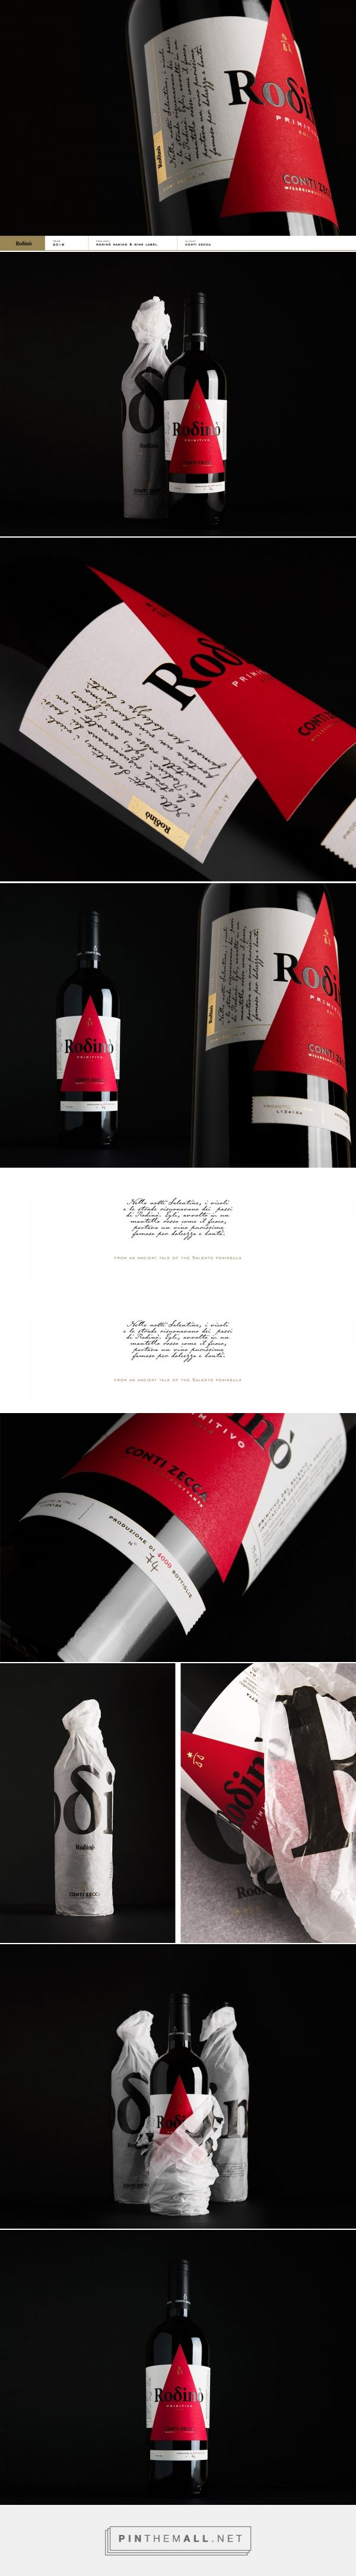 Rodinò - Conti Zecca #wine #label design by CaroselloLab - http://www.packagingoftheworld.com/2016/12/rodino-conti-zecca-wine-label.html